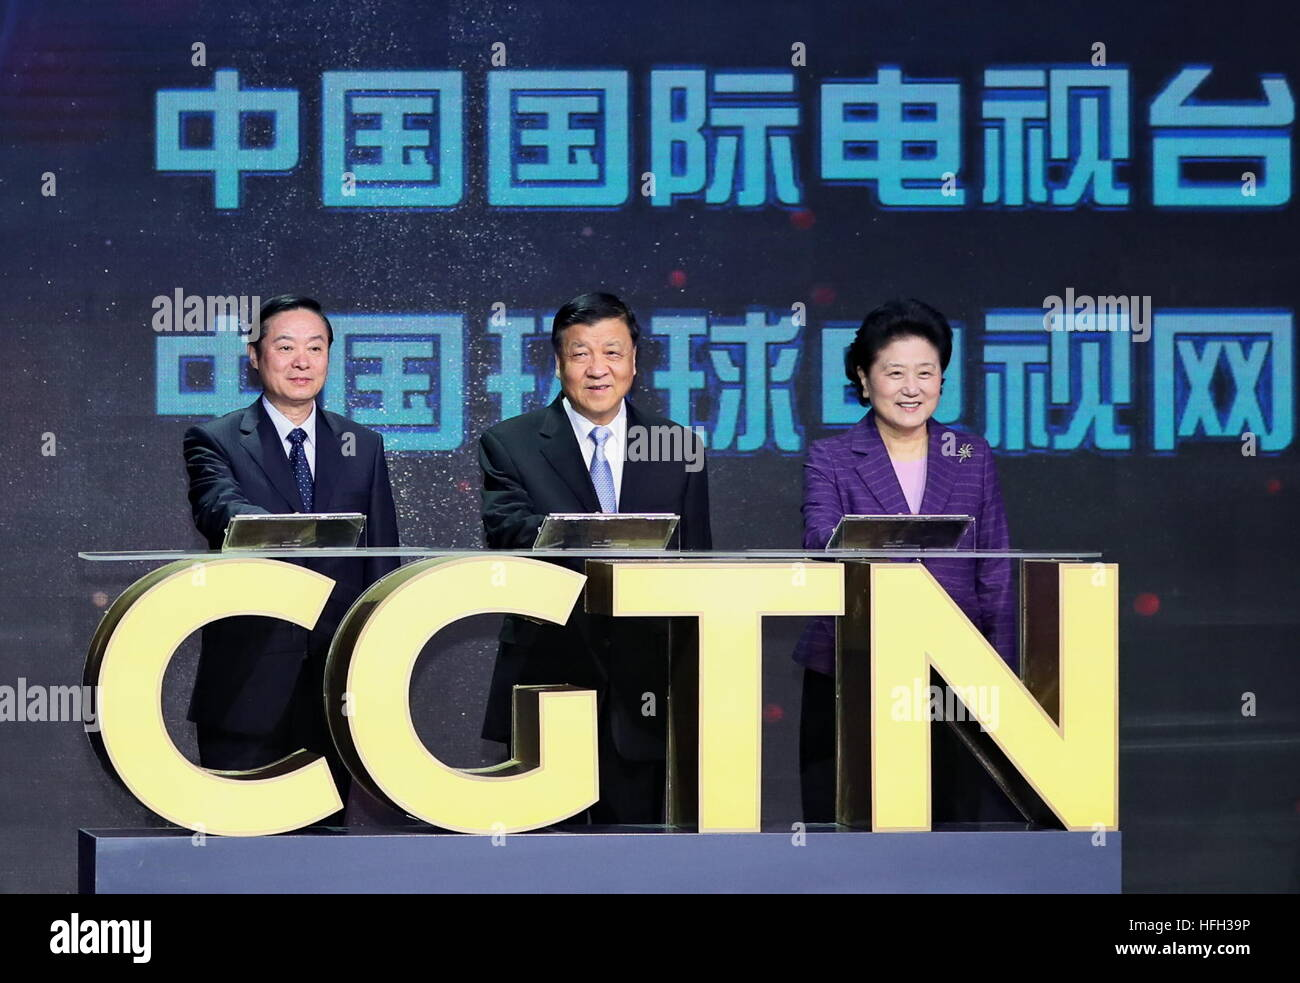 (161231) -- BEIJING, Dec. 31, 2016 (Xinhua) -- Liu Yunshan (C), a member of the Standing Committee of the Political Stock Photo